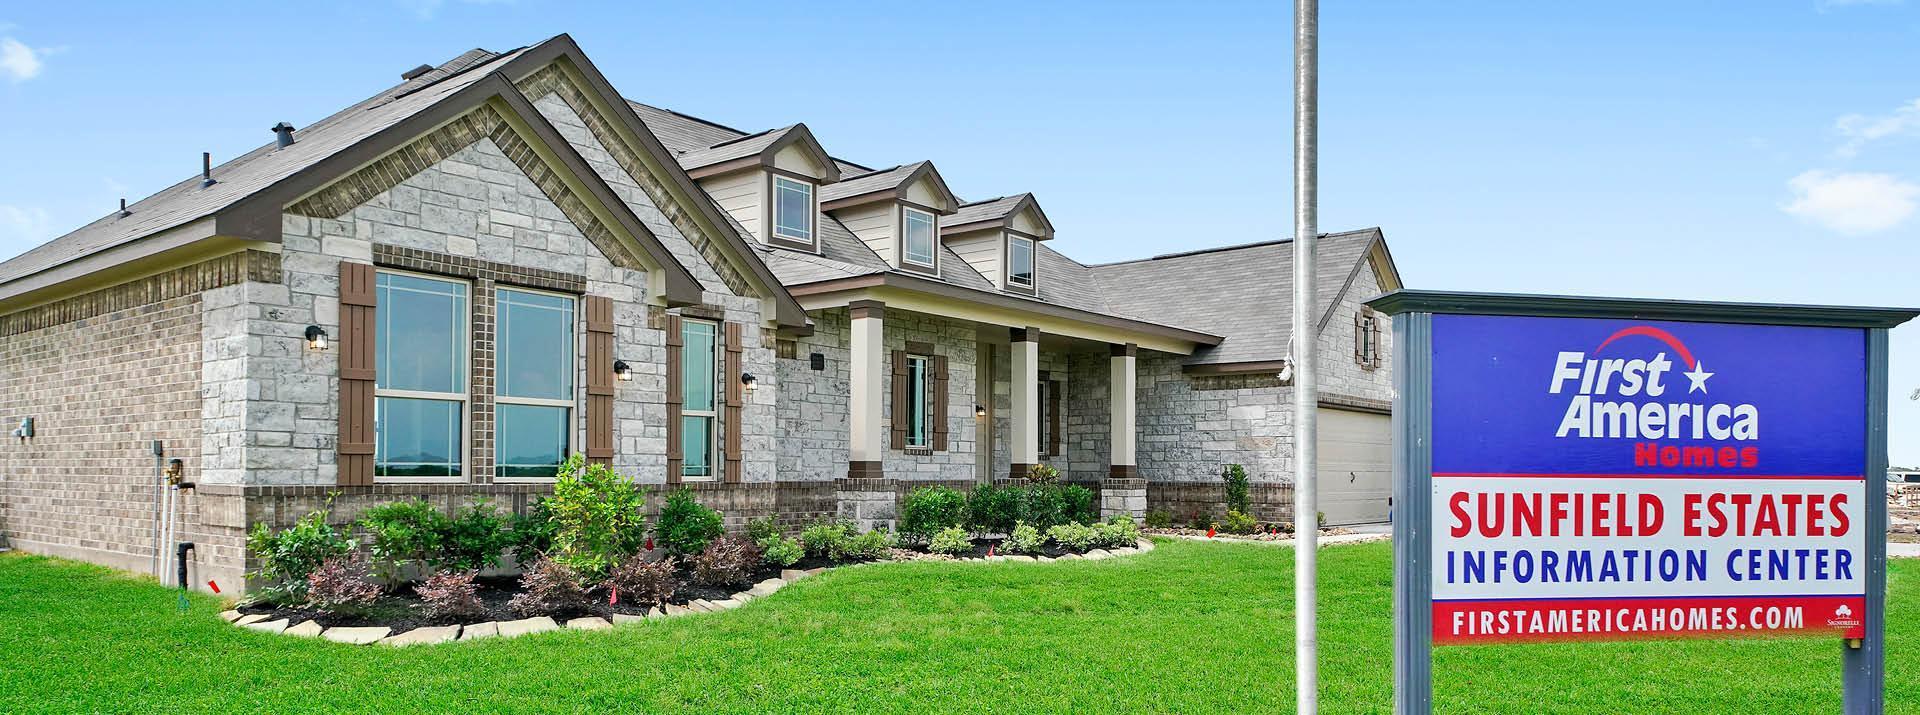 Sunfield Estates:First America Homes